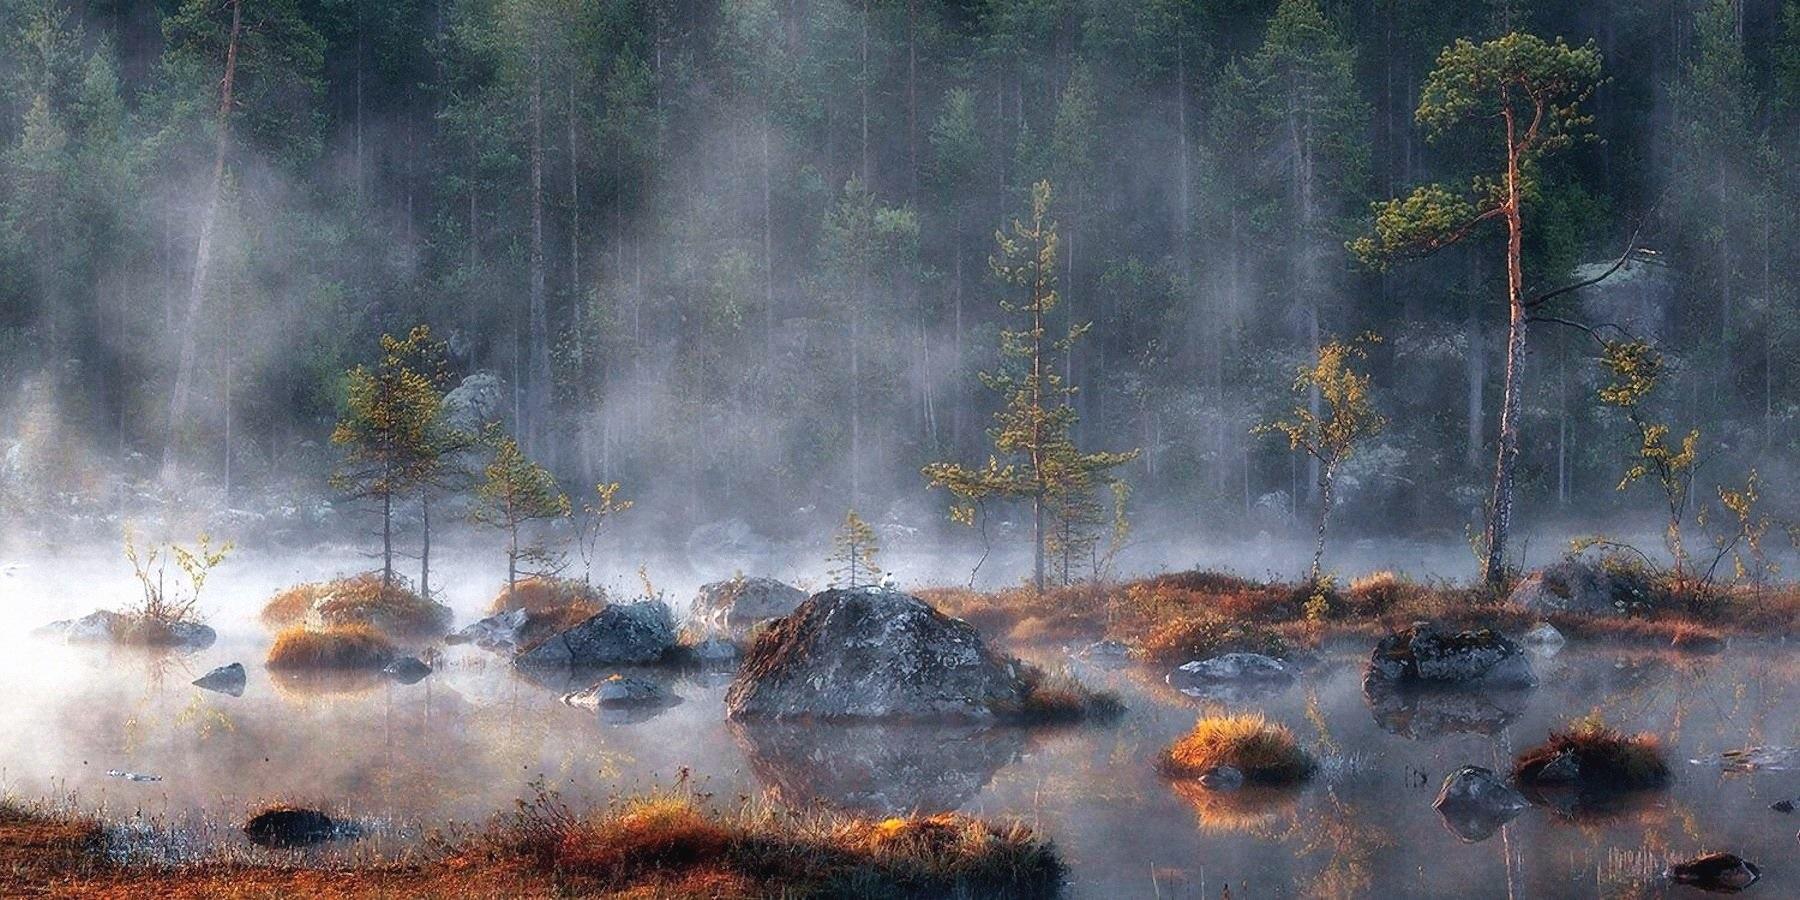 00 Lyubov Trifonova. Silence (Kola Peninsula). 2015